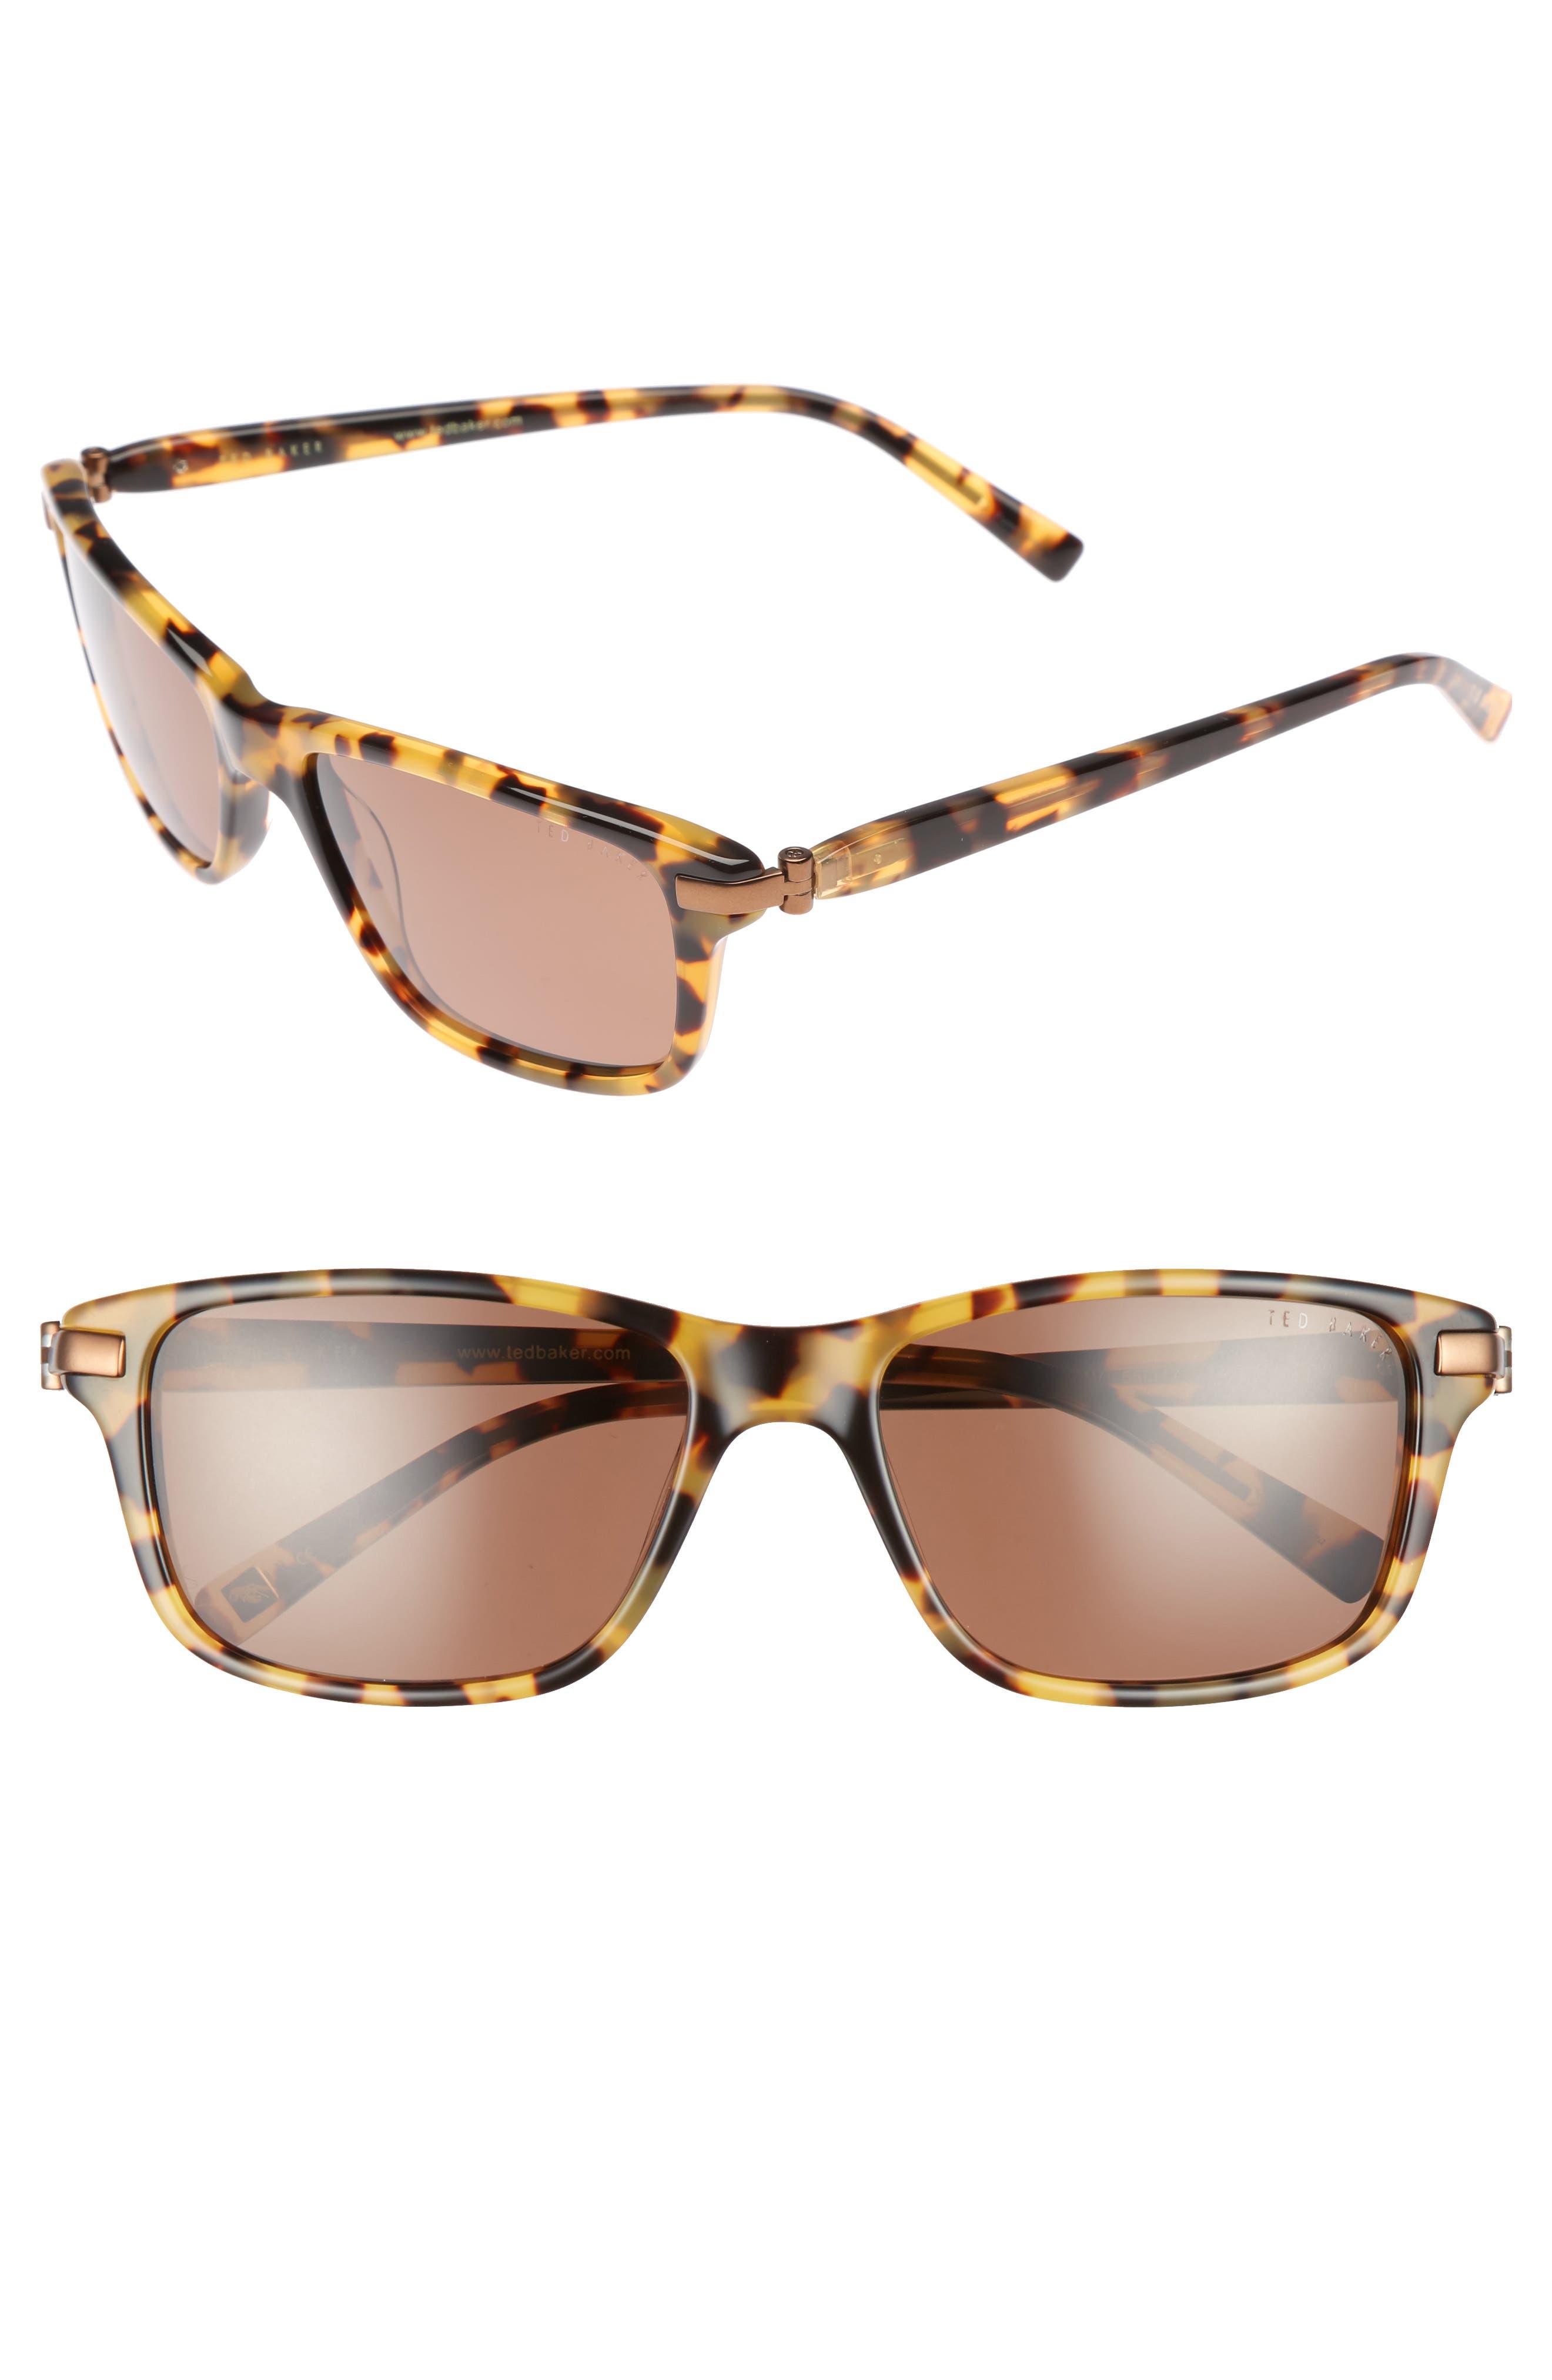 Main Image - Ted Baker London 55mm Polarized Sunglasses